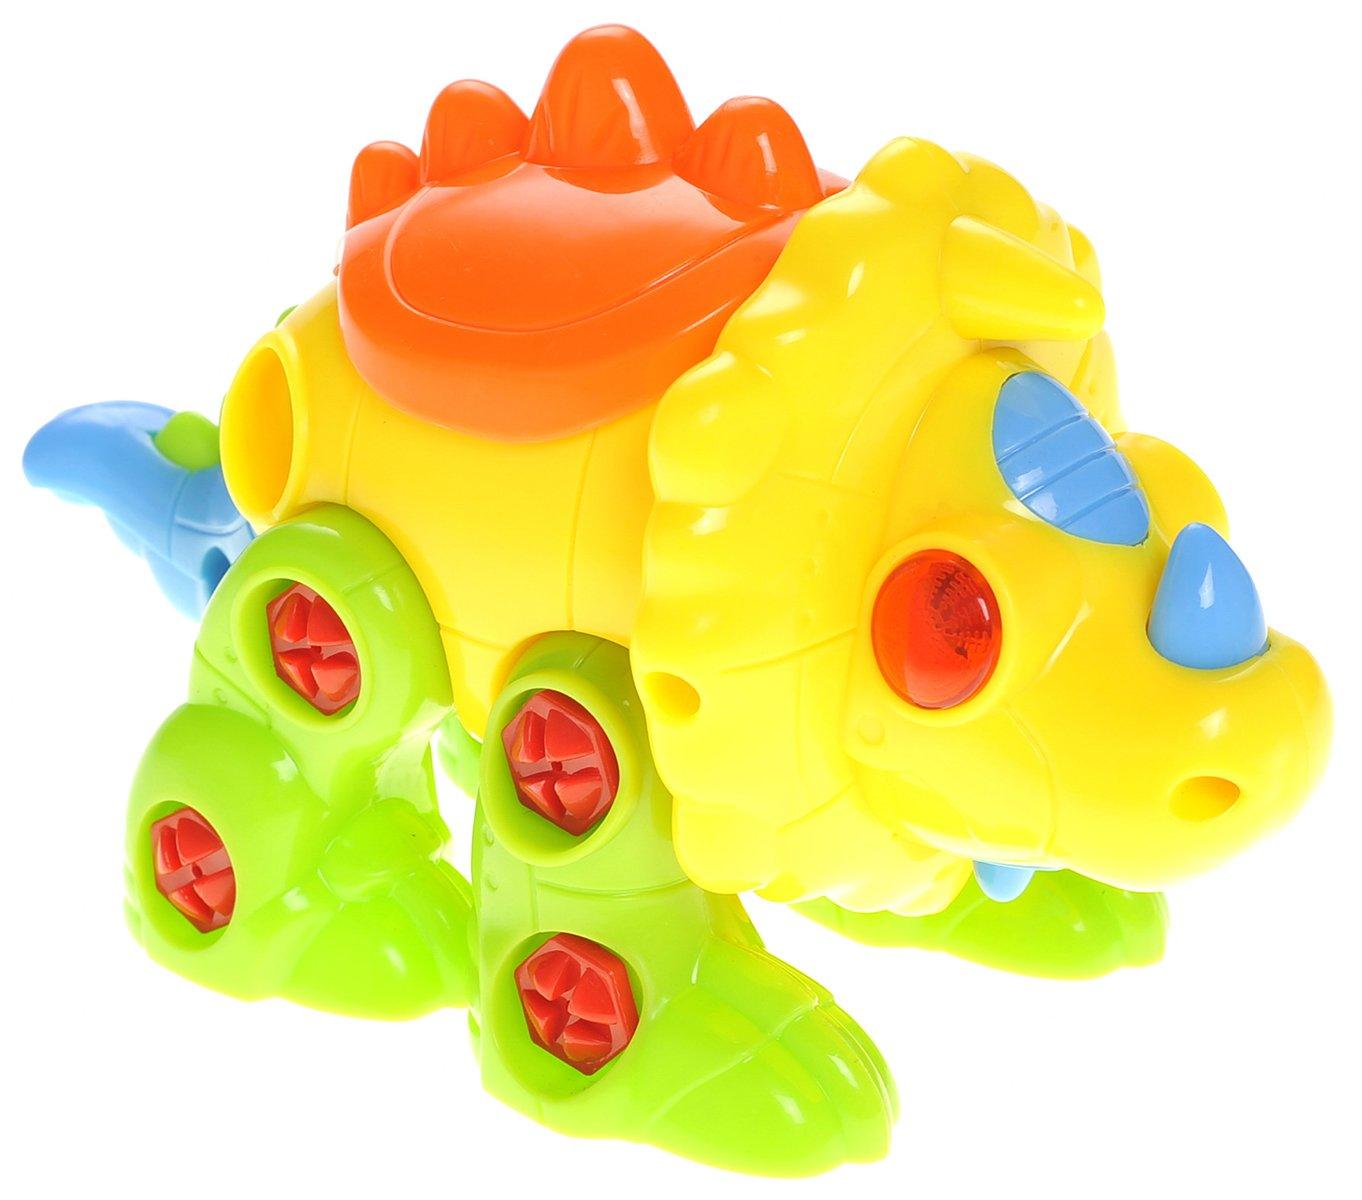 CHIMAERA Kids Brain Activity Interchangeable Triceratops Dinosaur Toy Playset